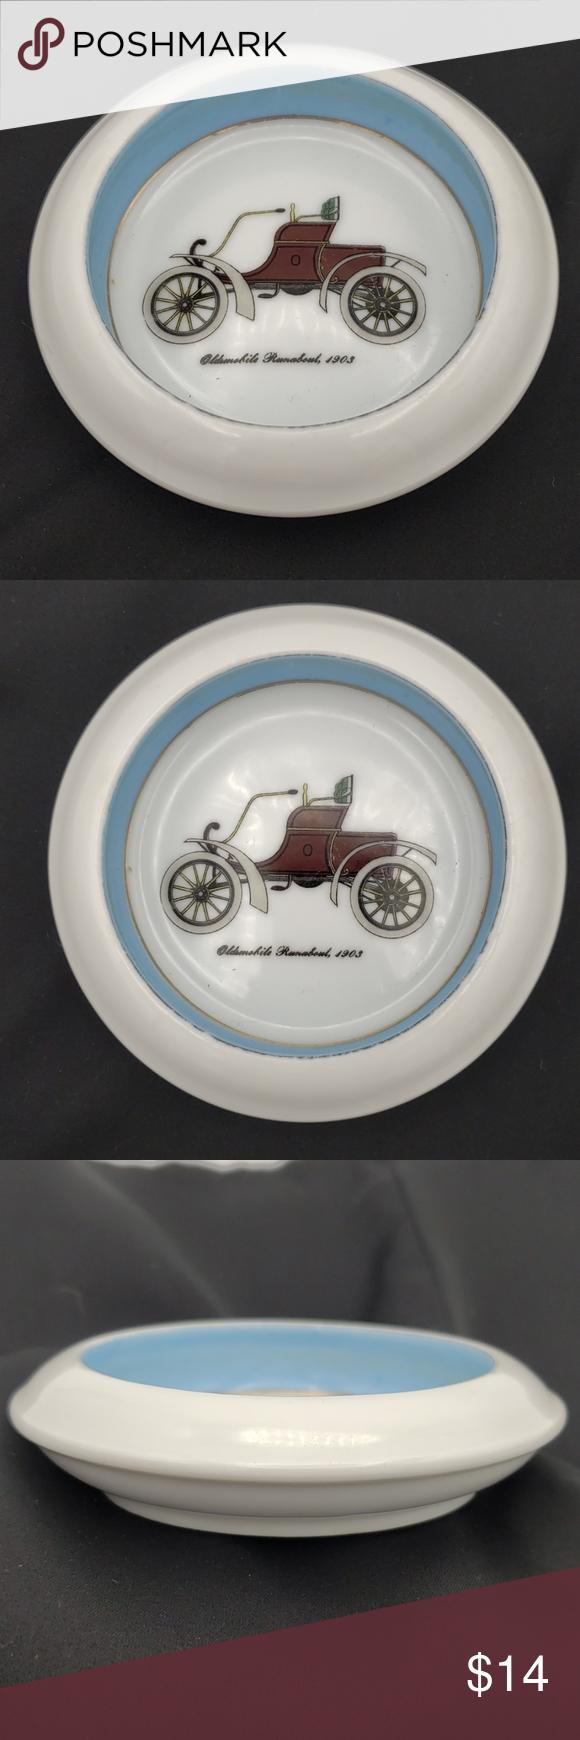 Oldsmobile Runabout 1903 Classic Cars Dish Ashtray Small vintage ceramic trinket…